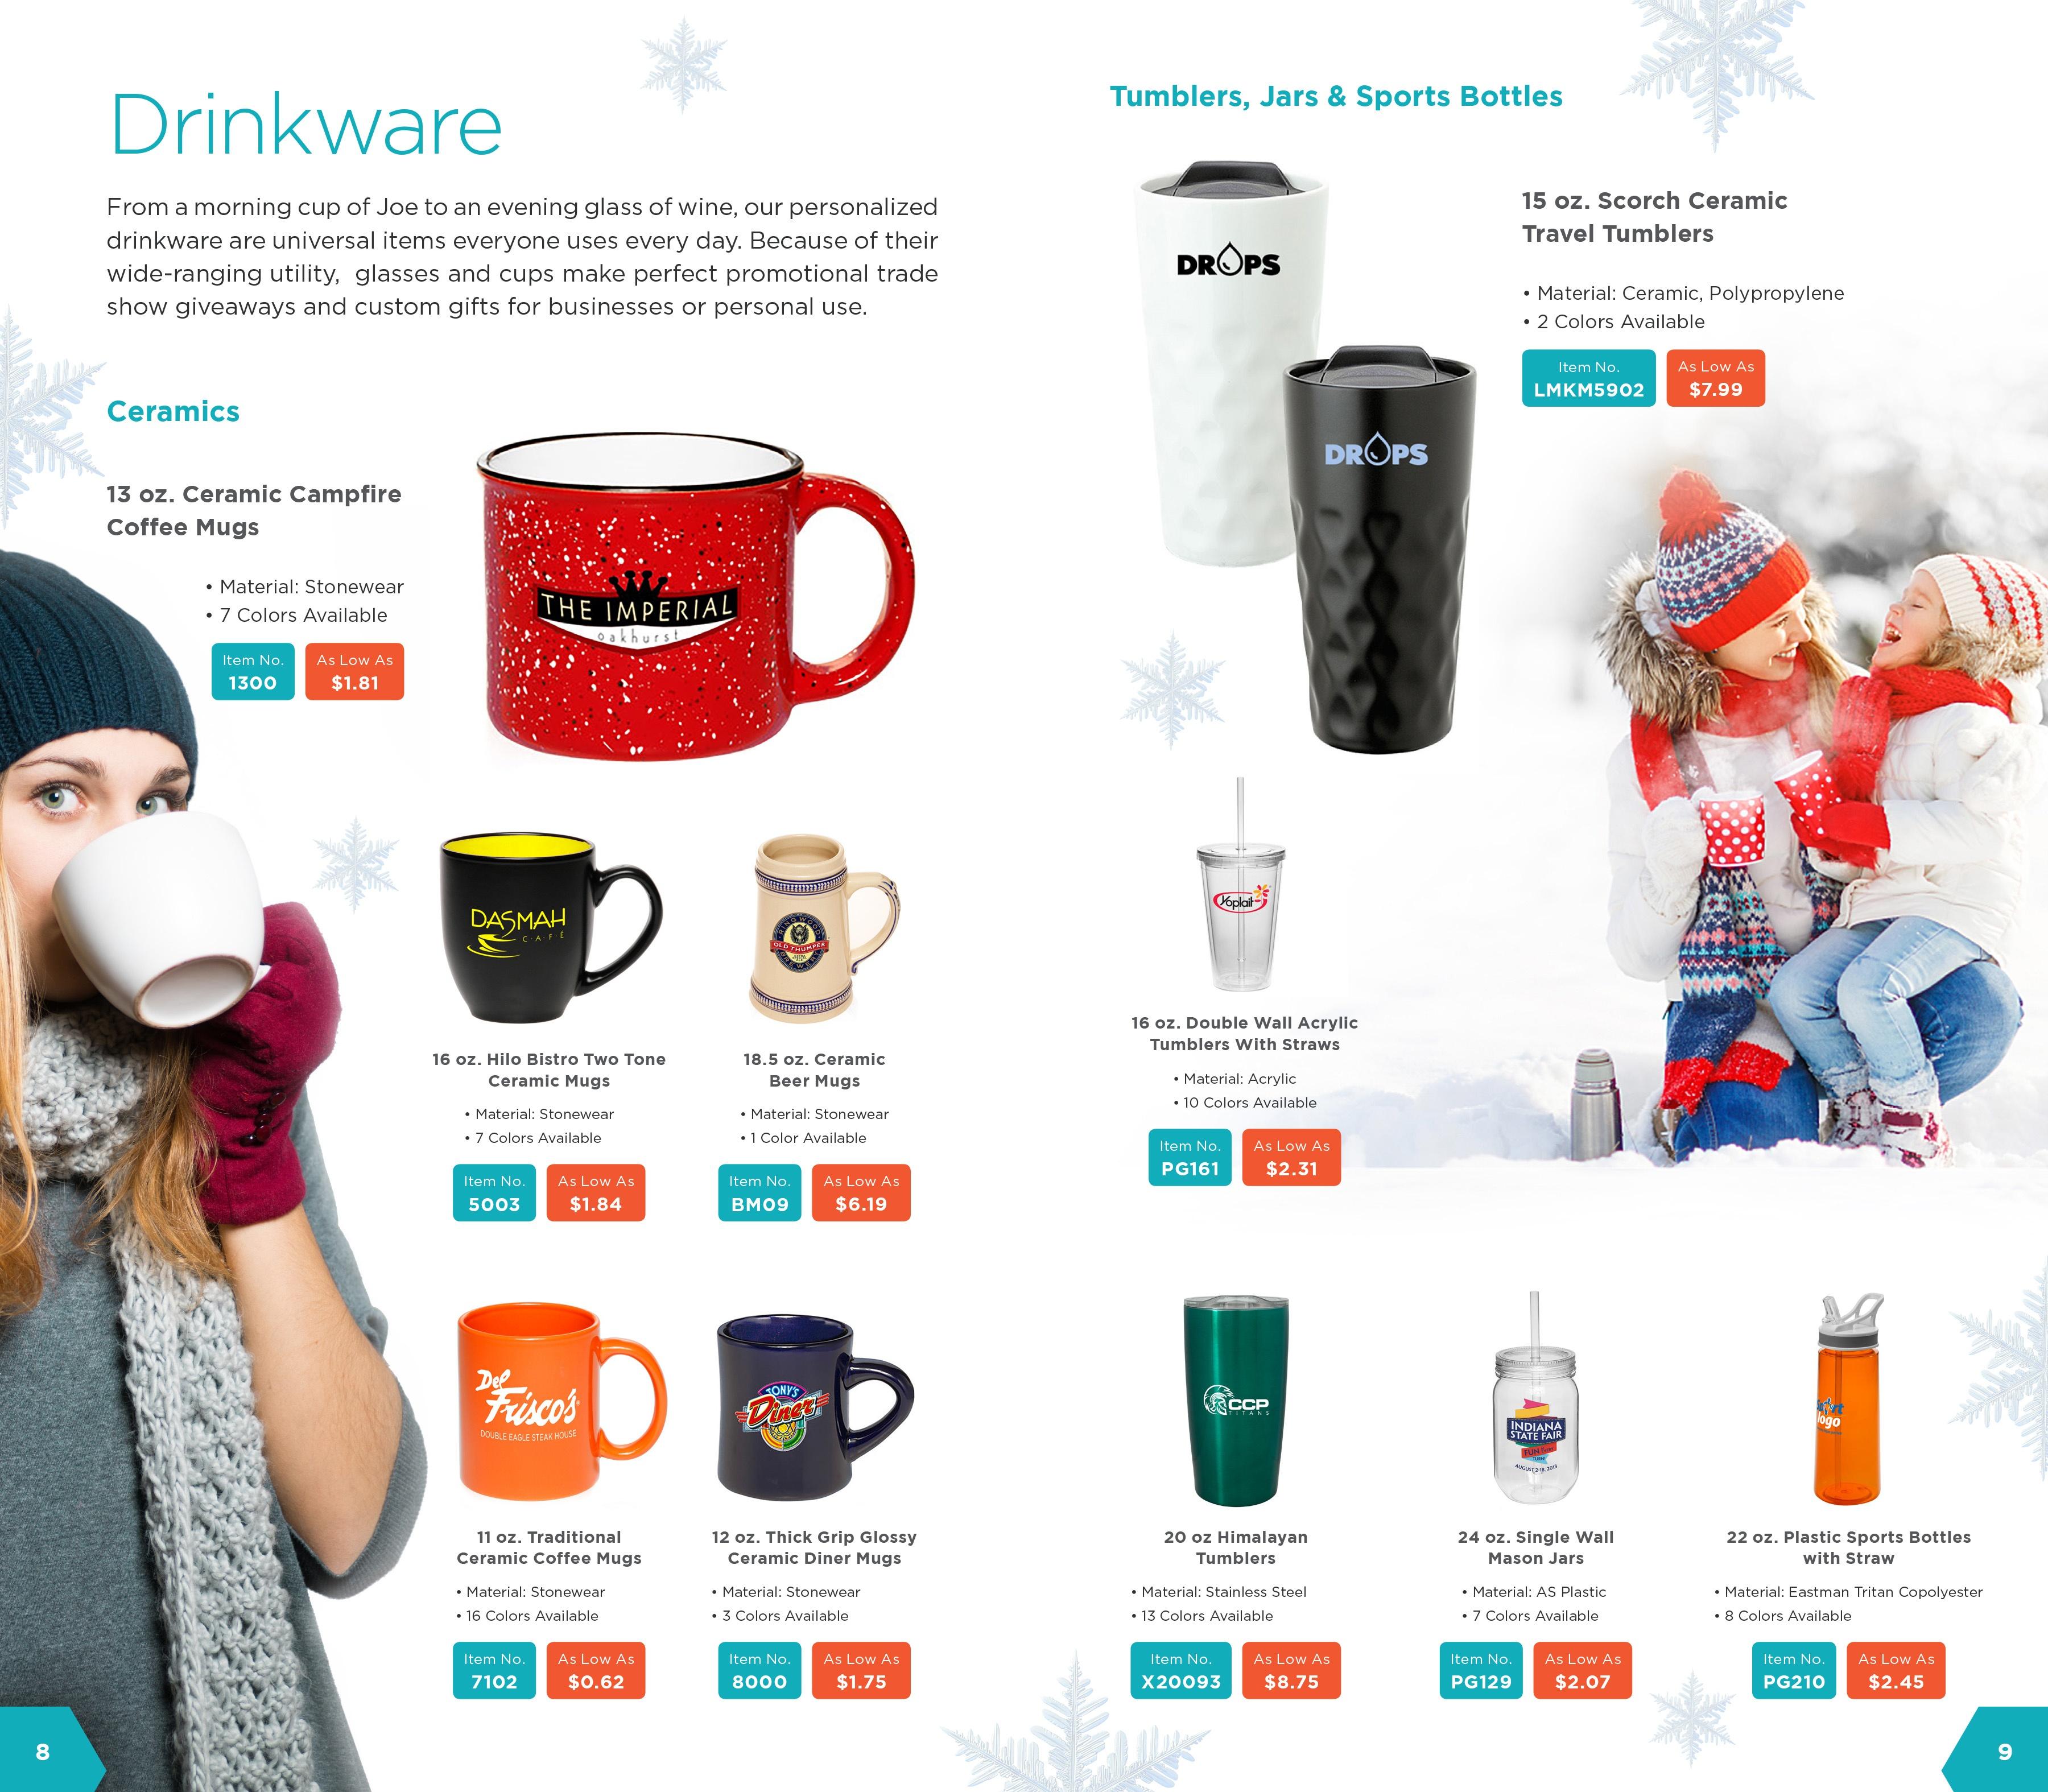 2018 DiscountMugs Winter Catalog_5.jpg